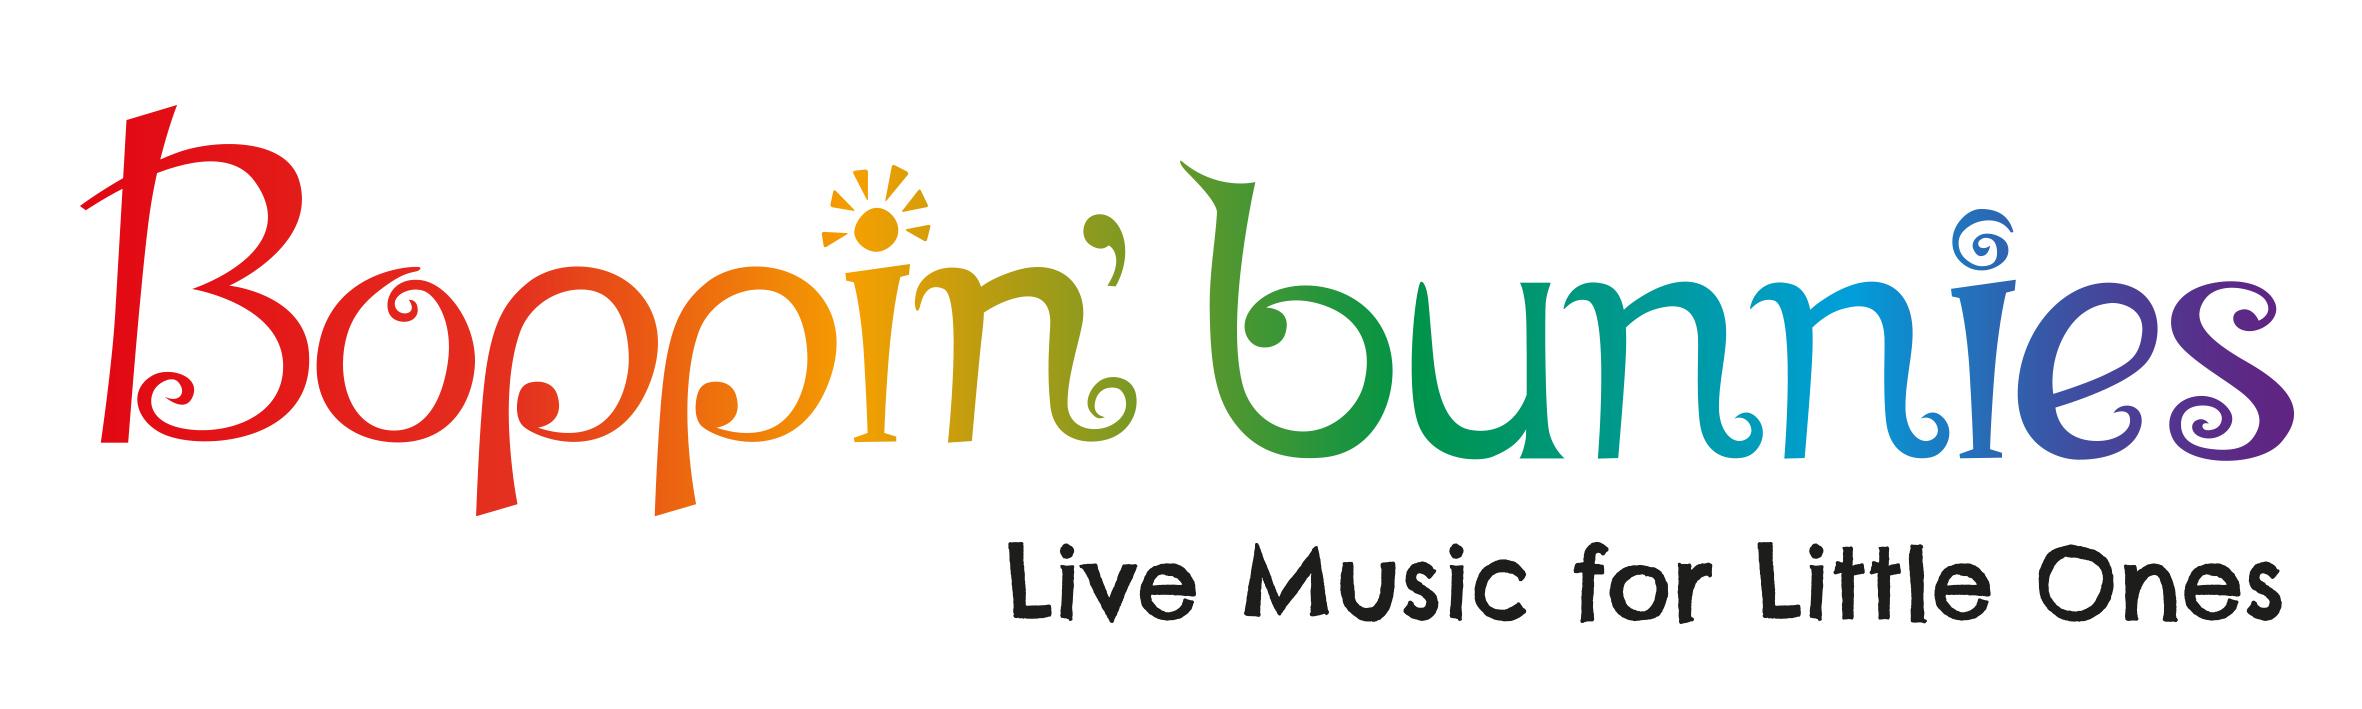 Boppin' Bunnies's logo